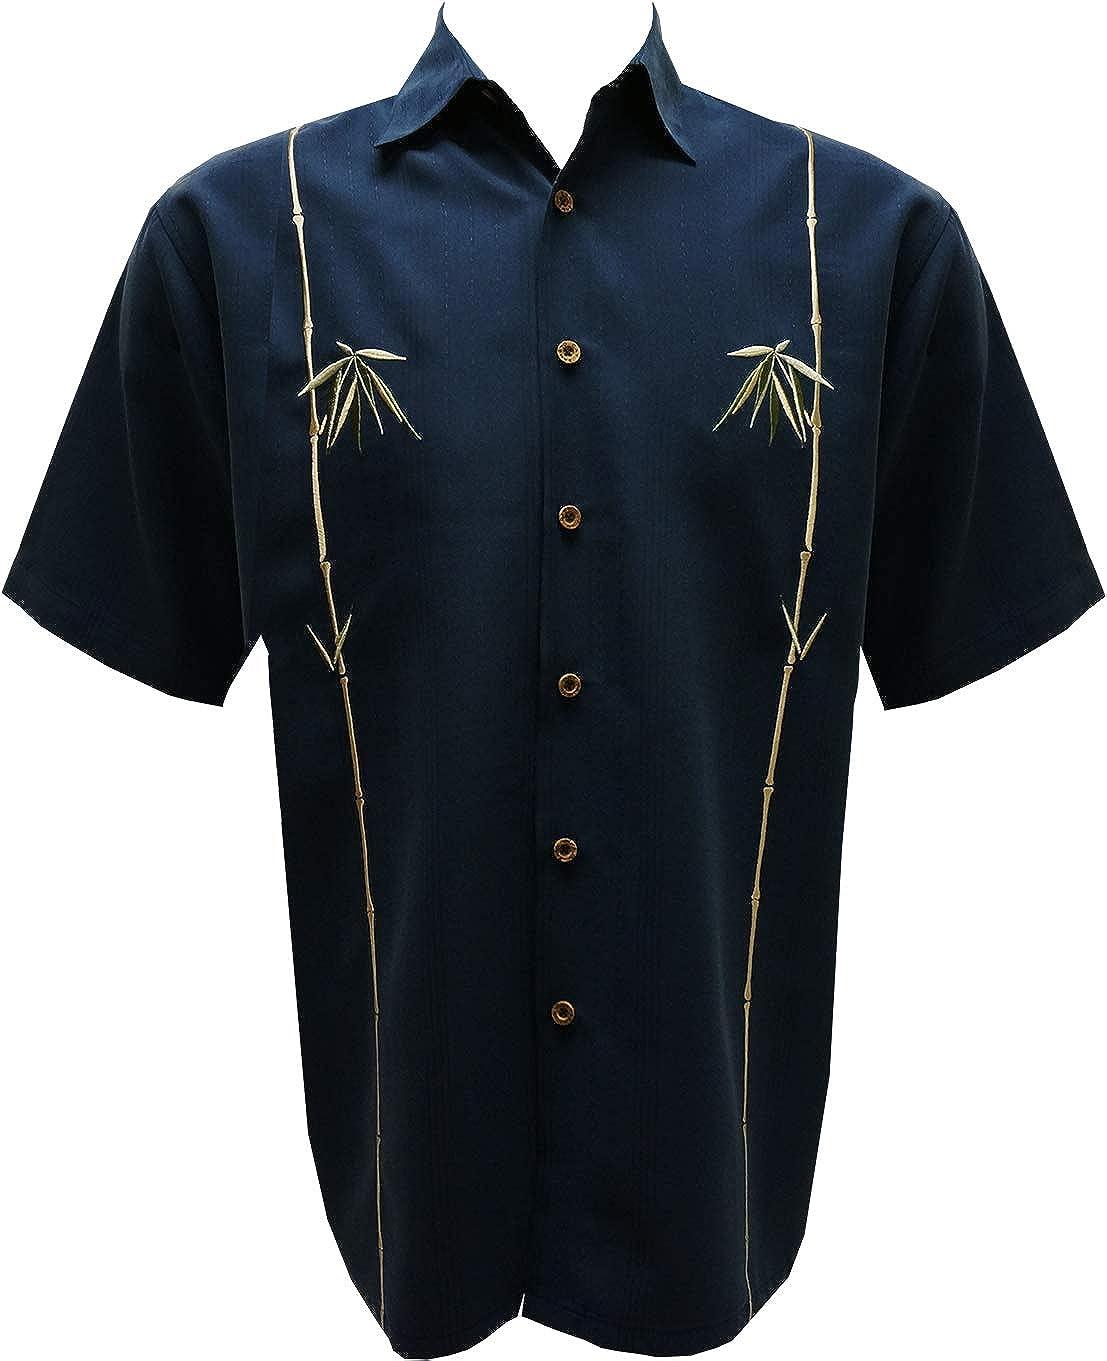 Bamboo Cay Mens Short Sleeve Dual Bamboos Casual Embroidered Woven Shirt